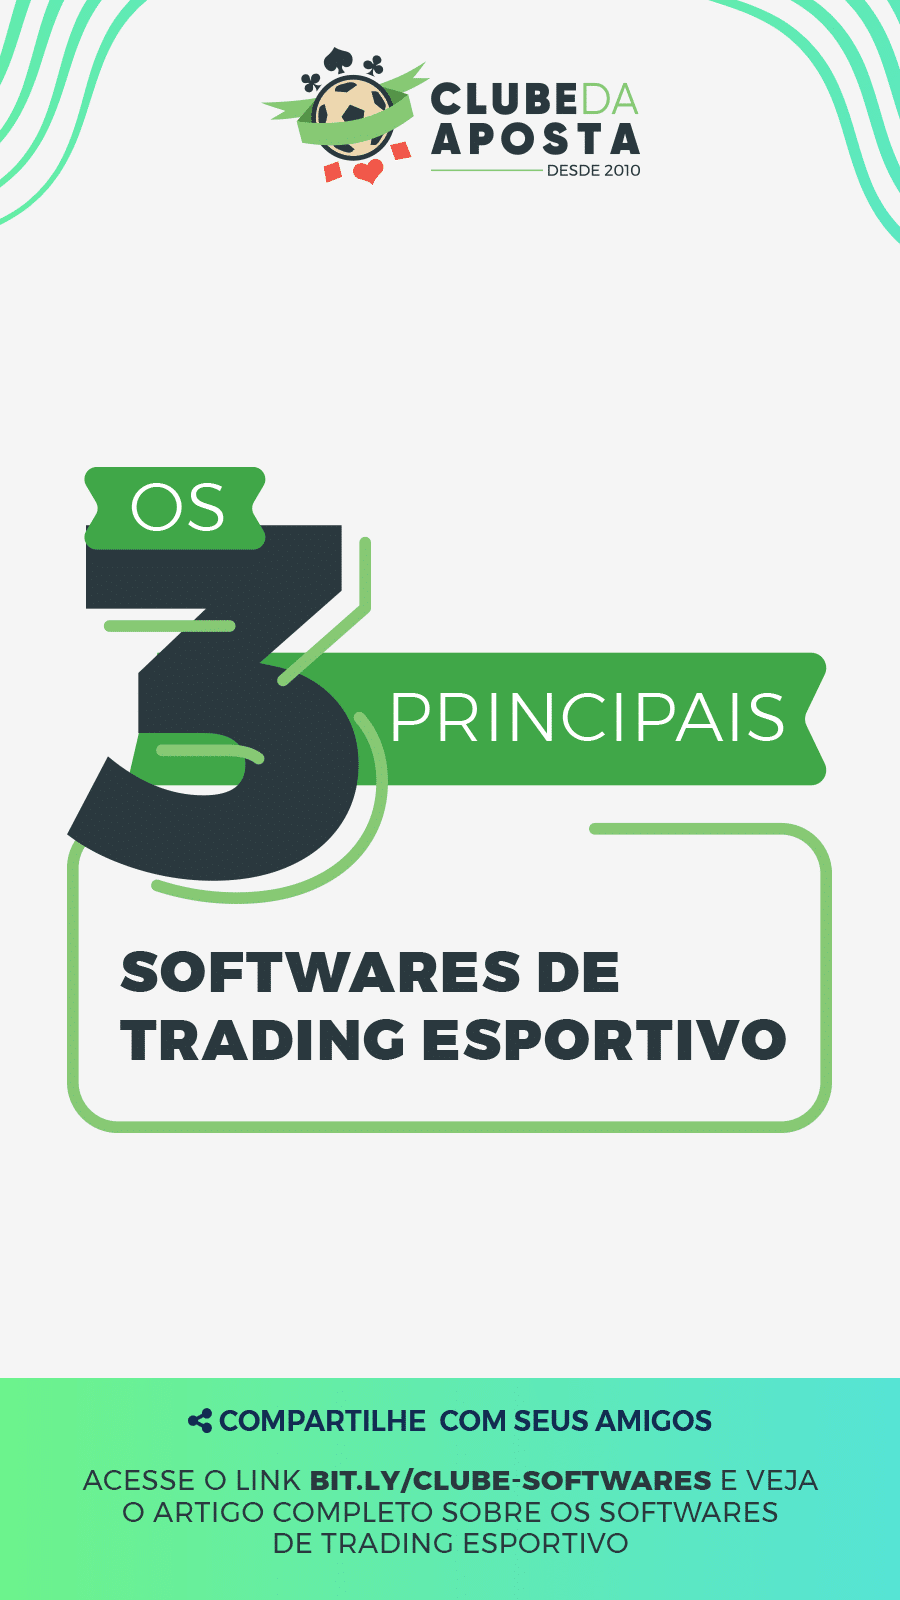 00-os-3-principais-softwares-de-trading-esportivo